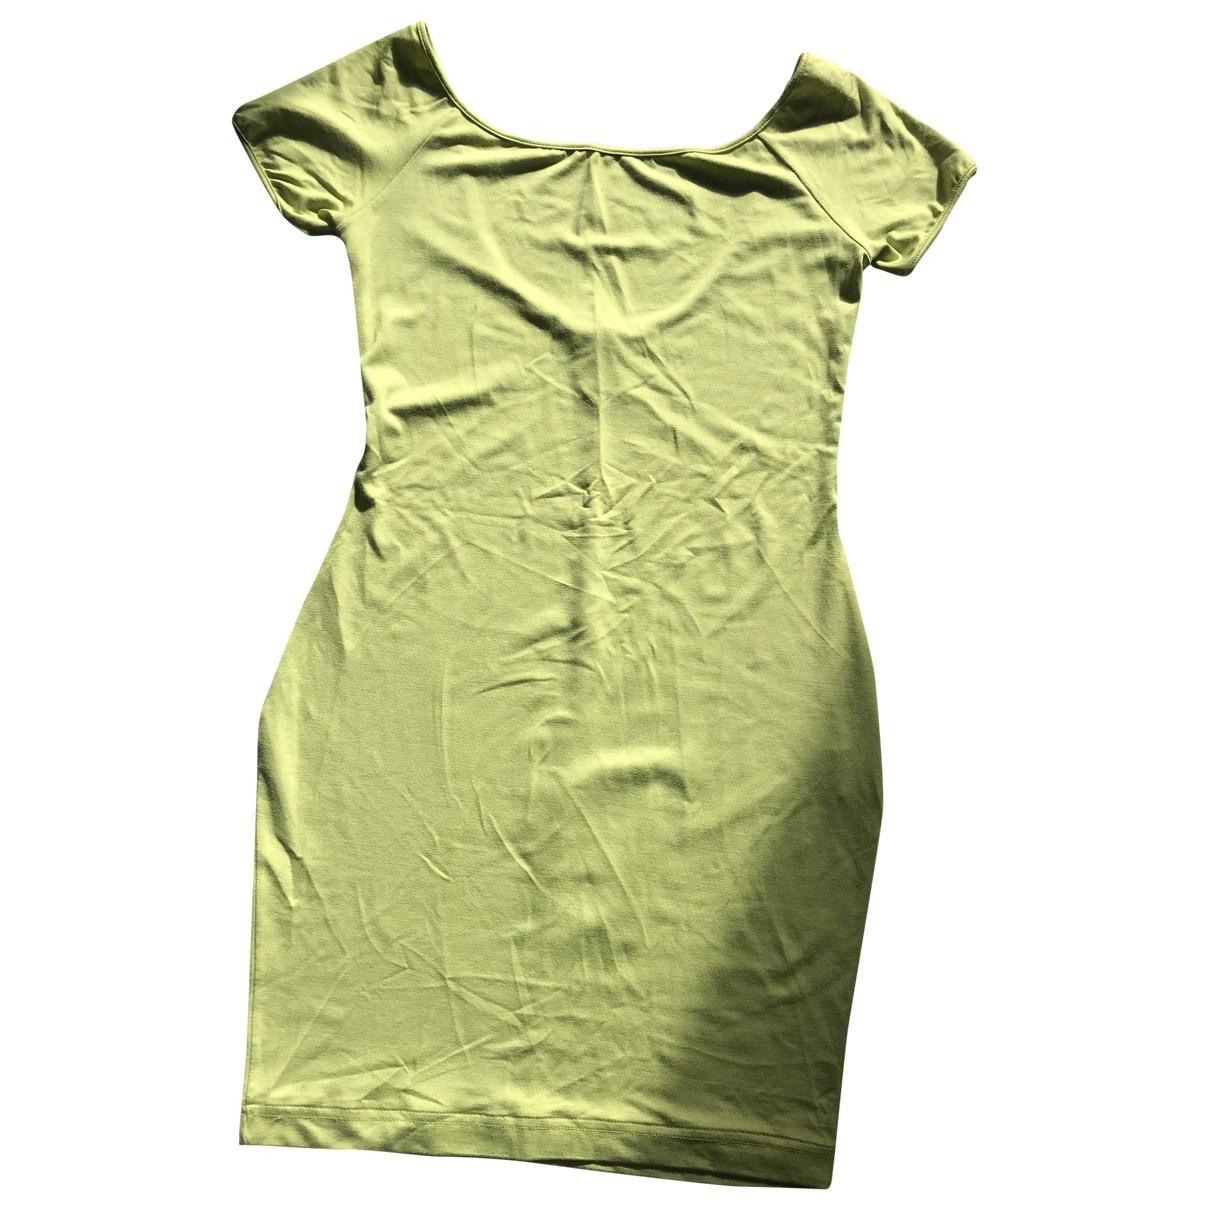 Max Mara \N Yellow dress for Women S International